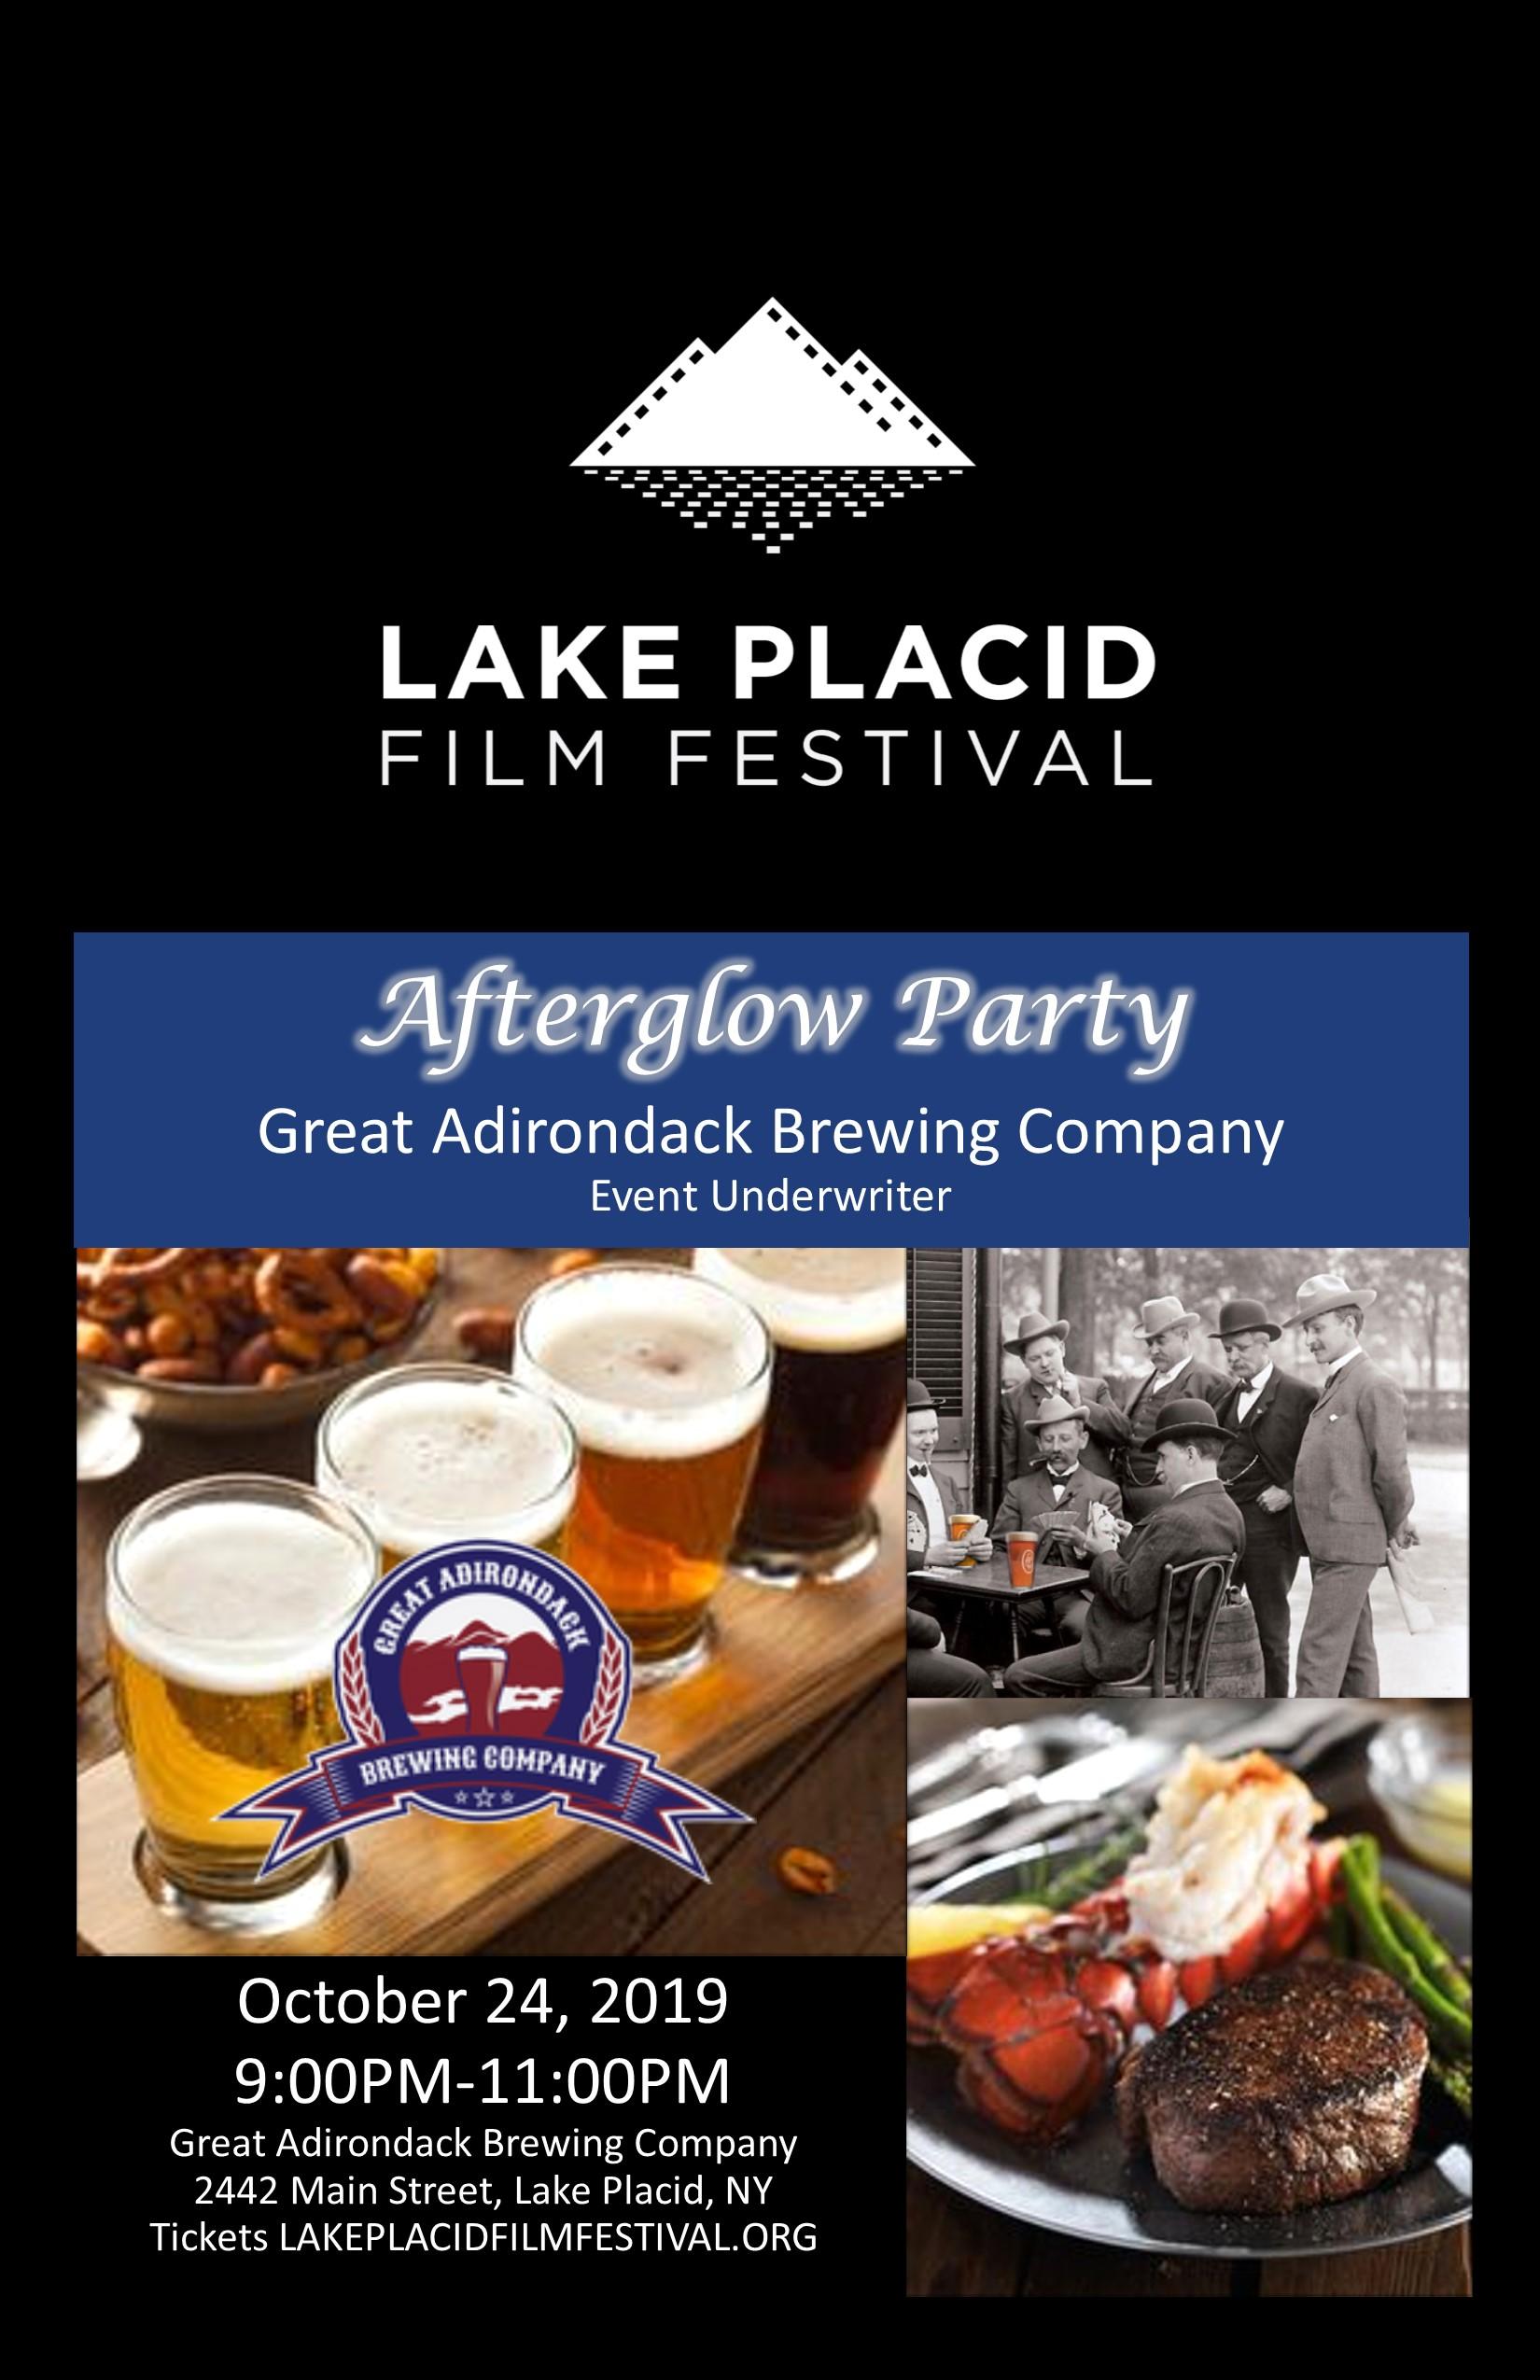 Afterglow Party GABC 10-24-19 Poster 11x17 Final 5-22-19.jpg